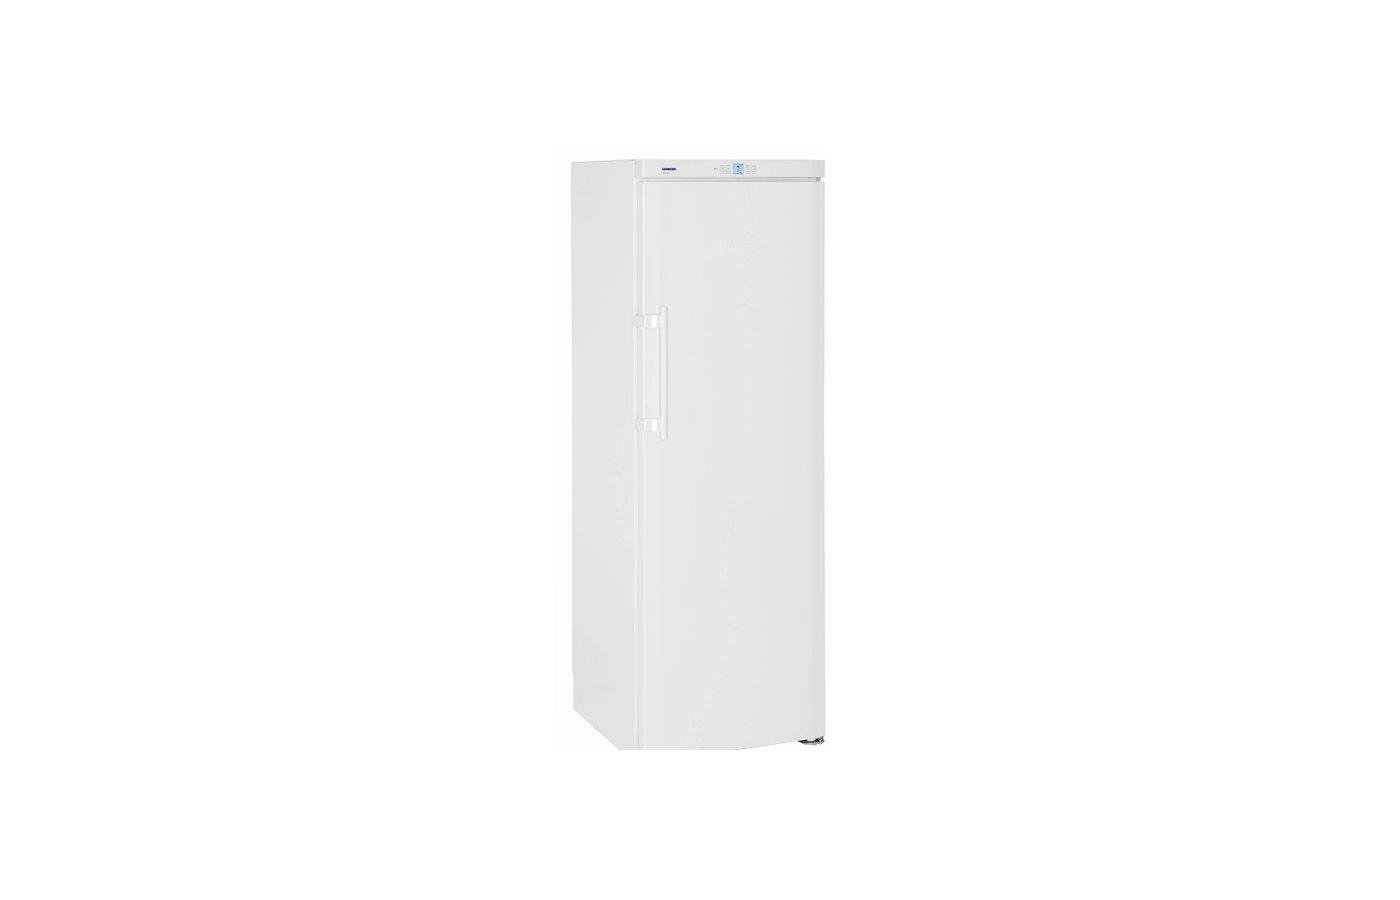 Морозильная камера вертикальная LIEBHERR G 4013-20